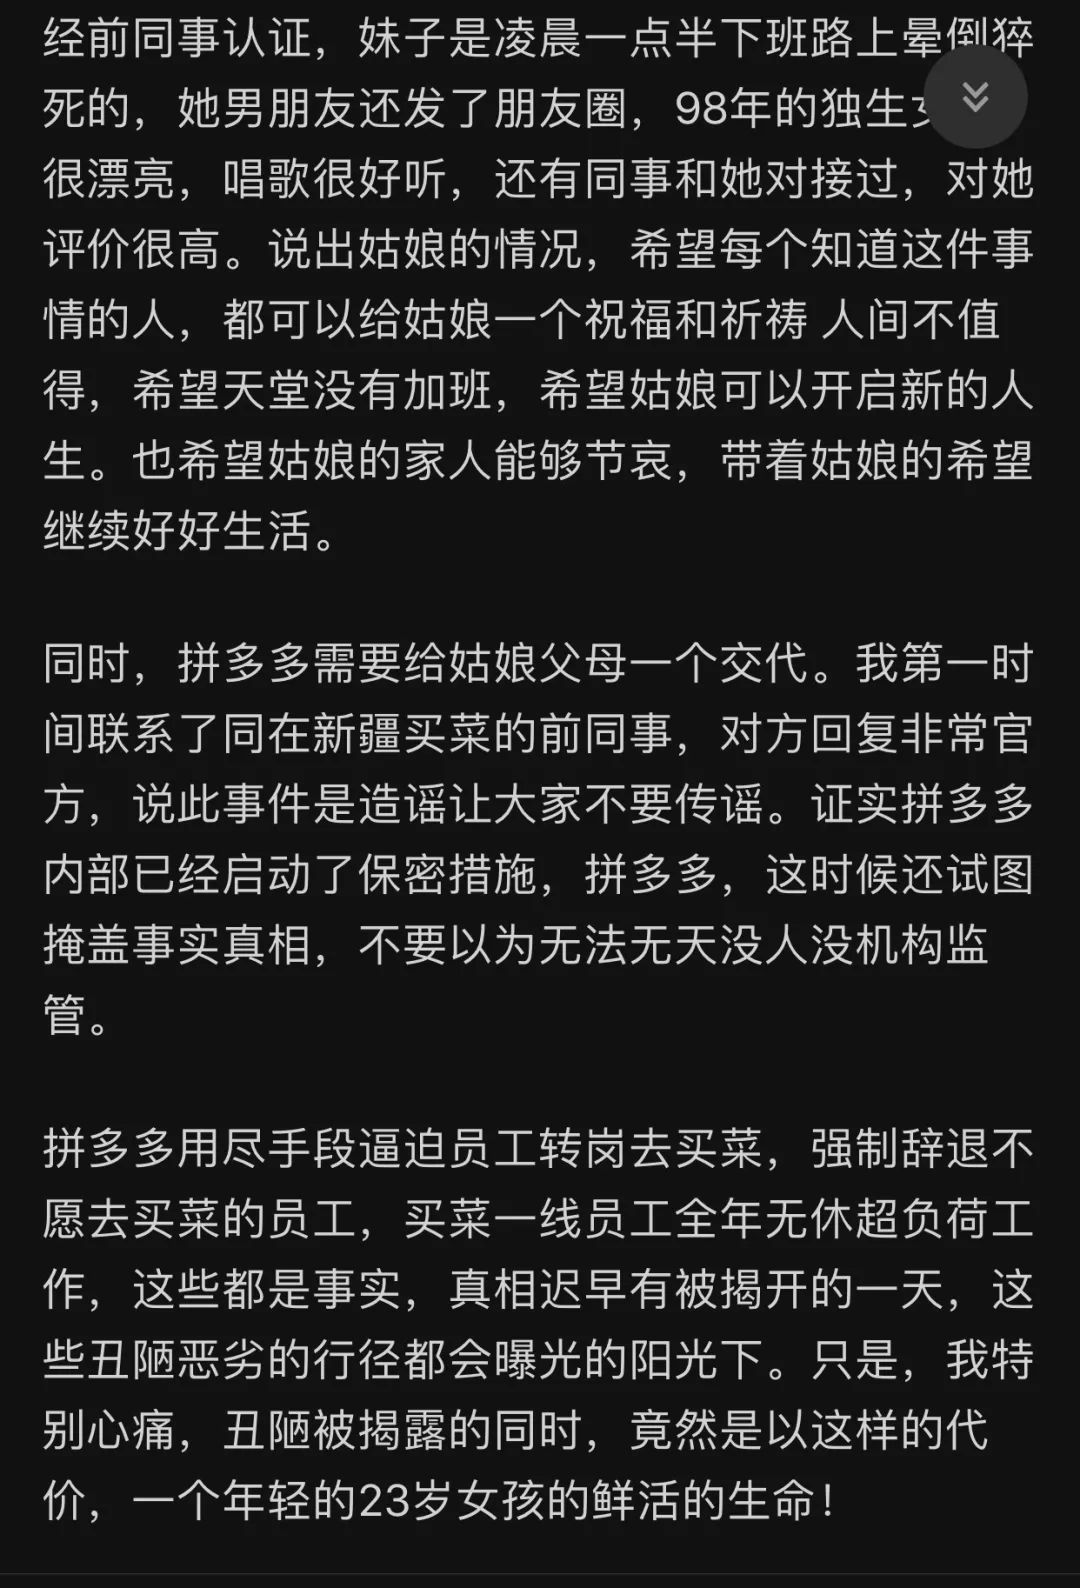 article/346AE8B8A2AC47C7B56FB48A8AFA8D2E/20210111005639.jpg